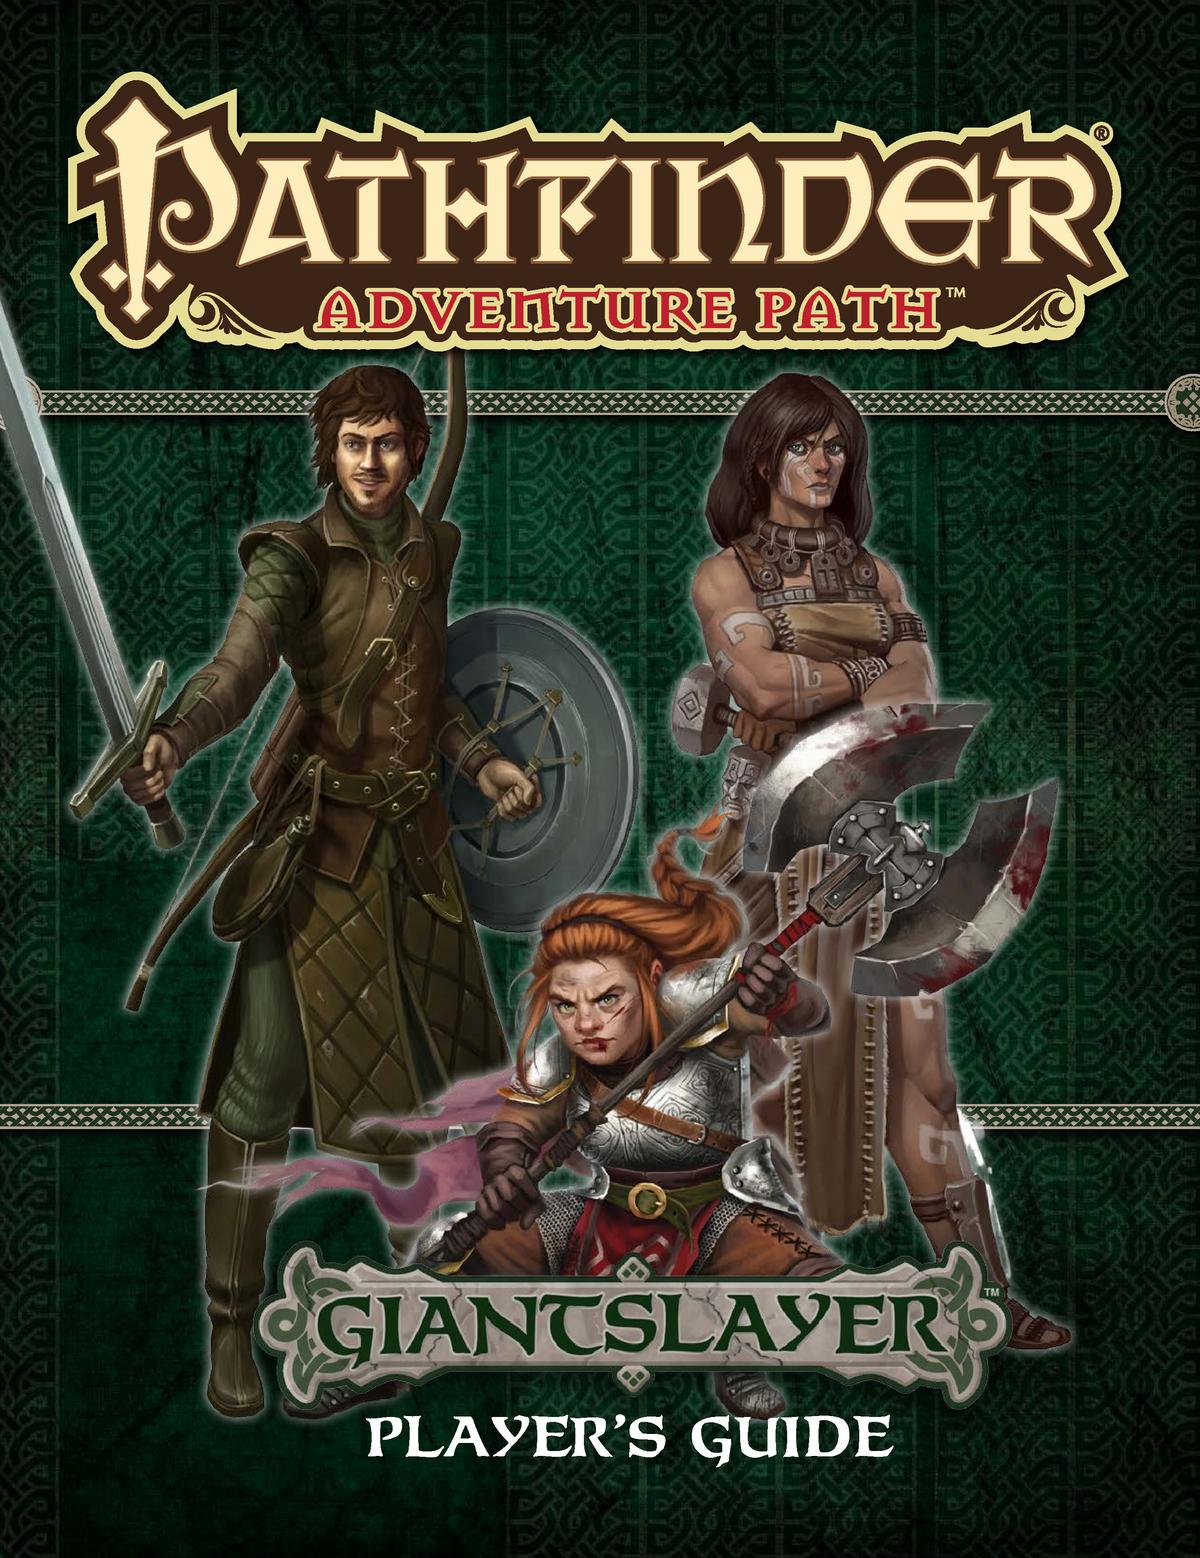 Giantslayer - Player's Guide - Electronica 2222 - StuDocu